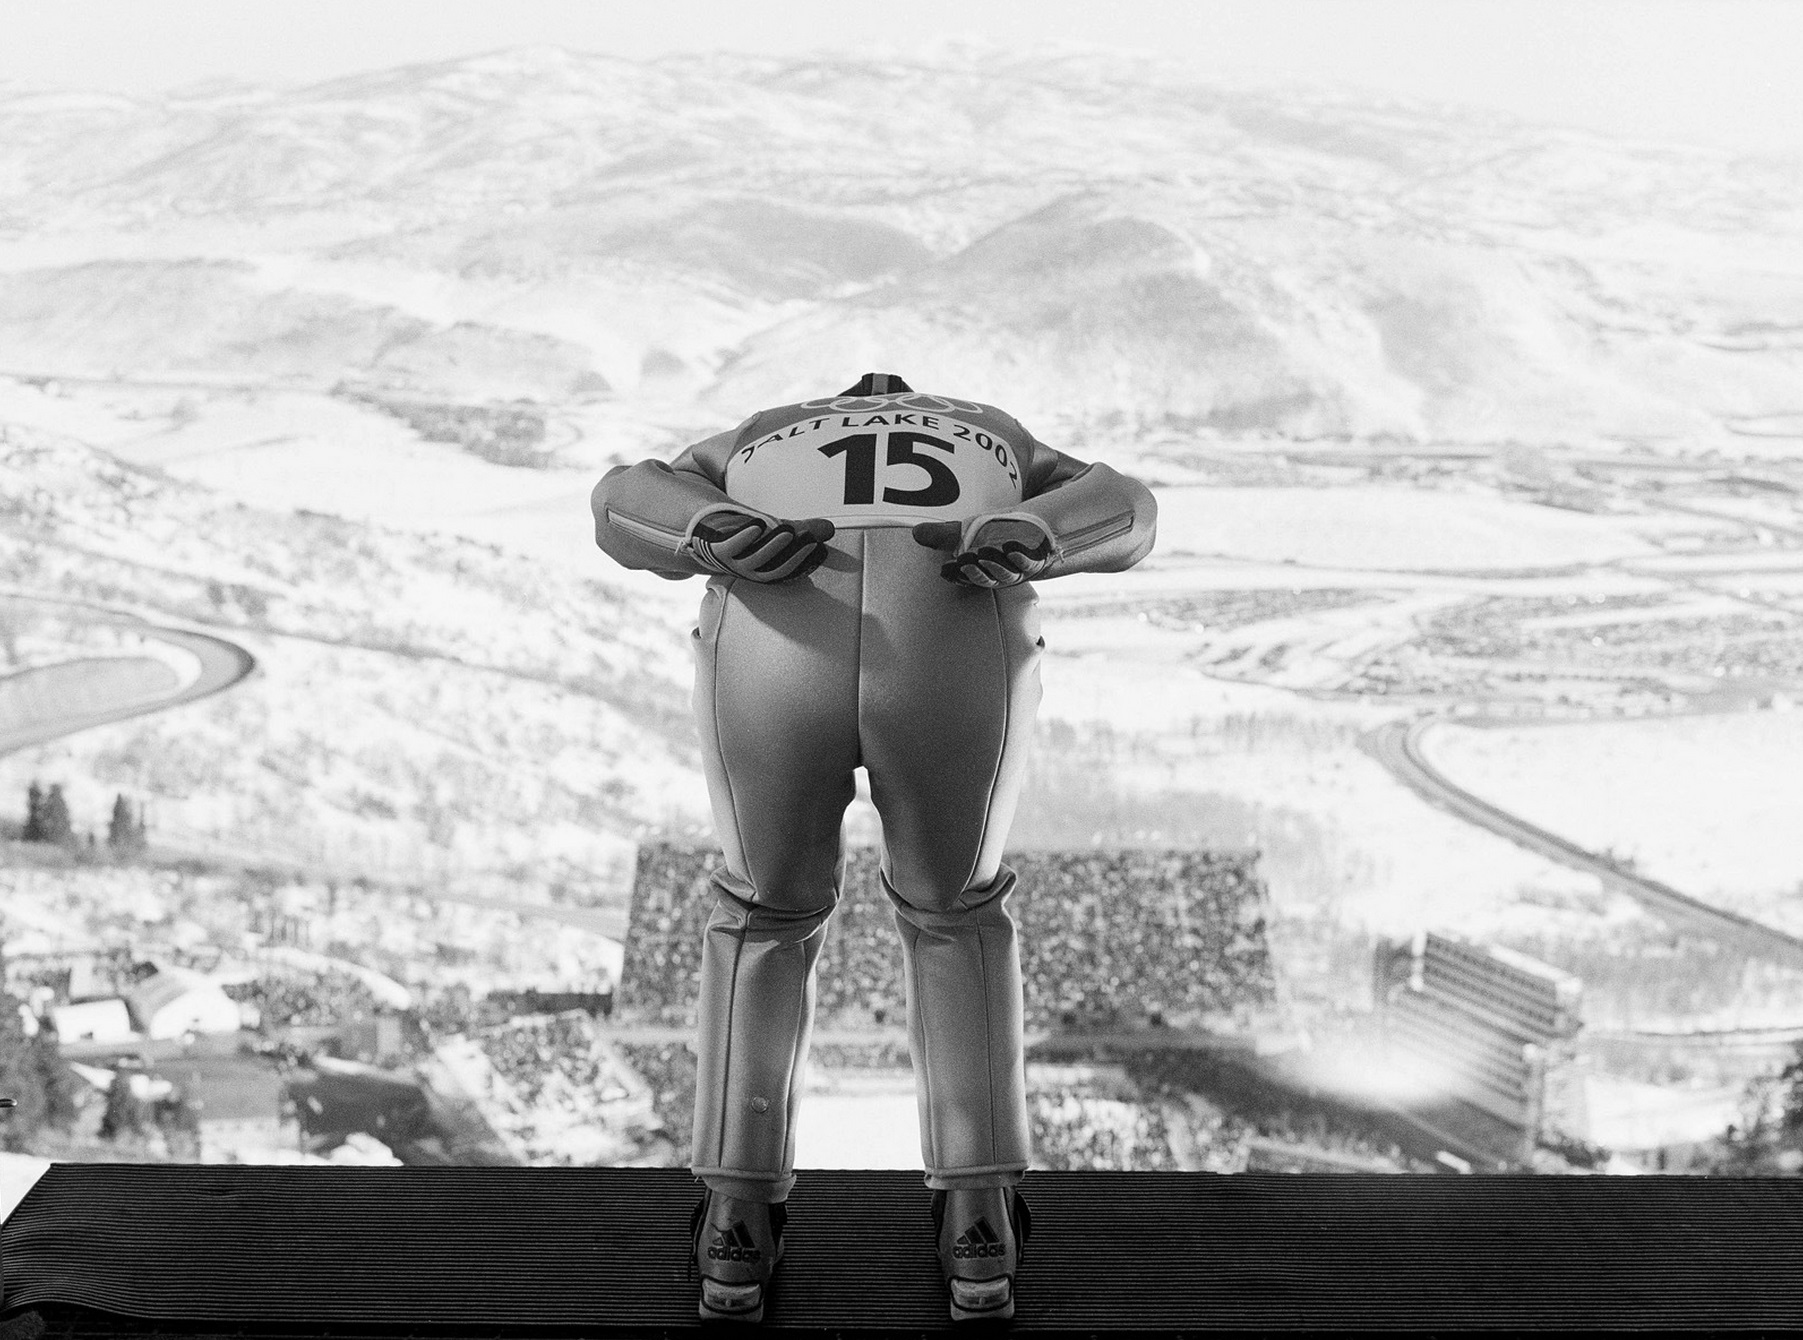 Men's 120k Ski Jump, Winter Olympics, Park City, Utah, February 2002. © 2015 David Burnett/Contact Press Images